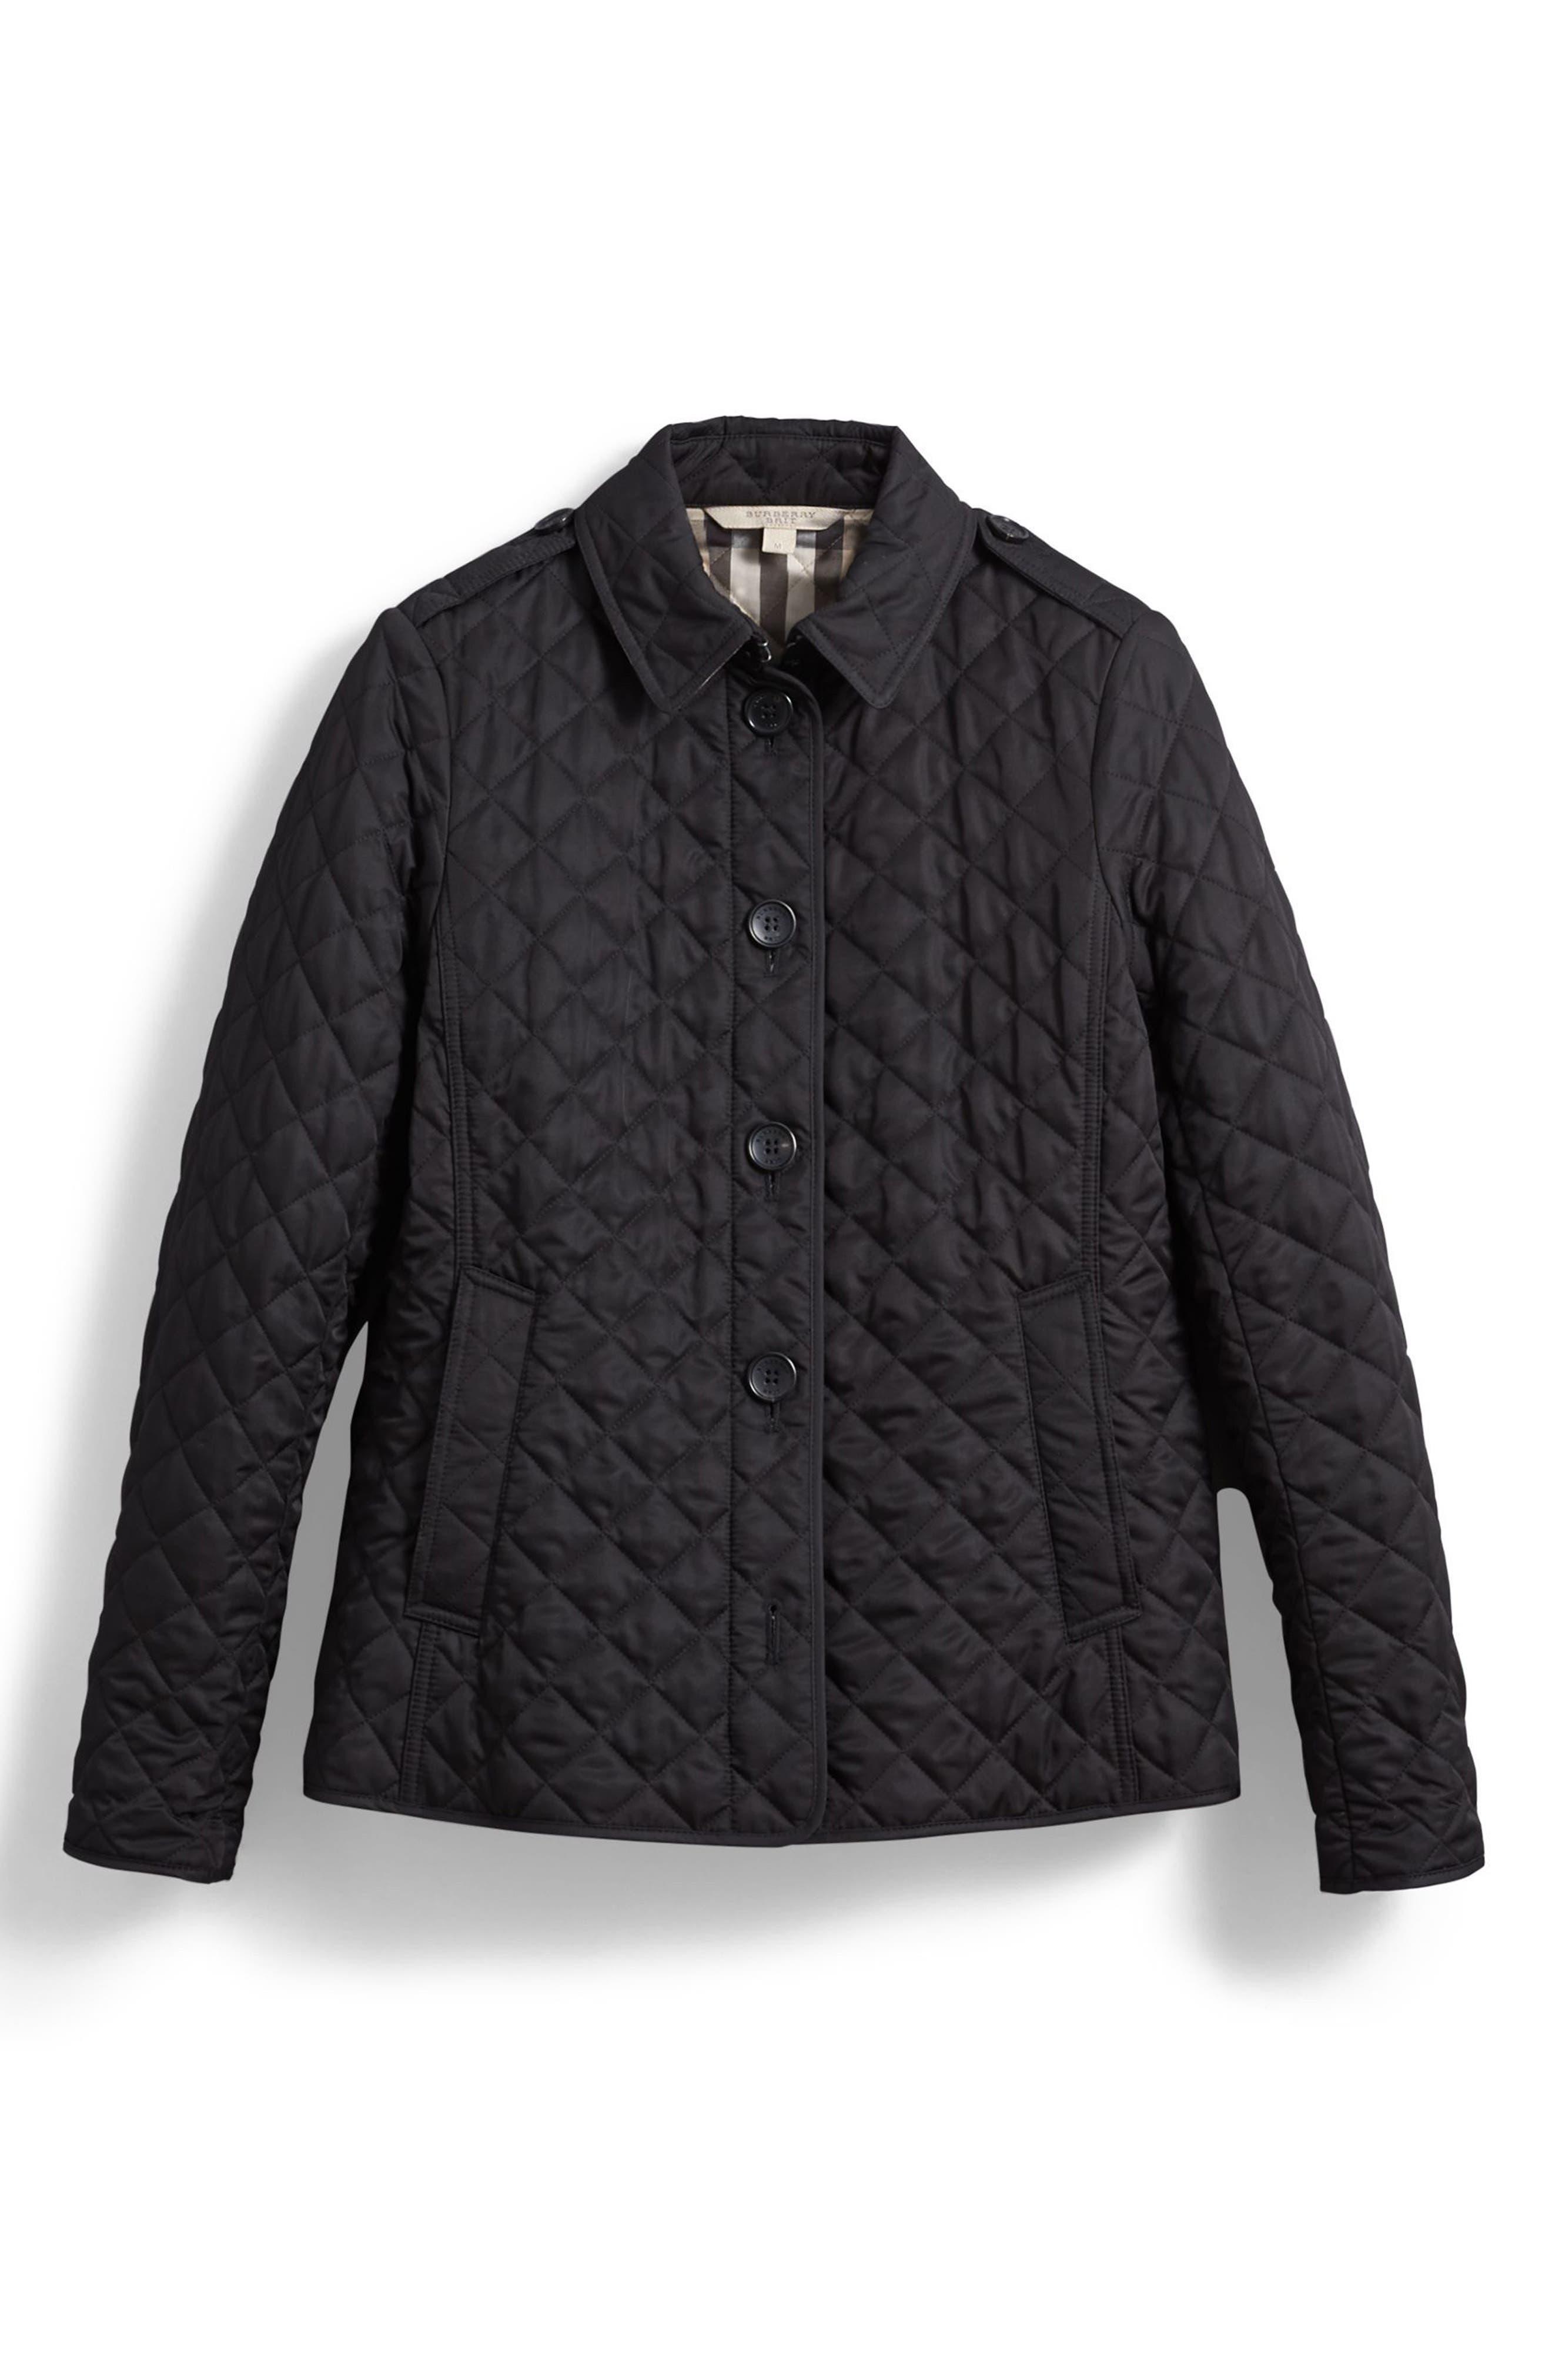 Ashurst Quilted Jacket,                             Alternate thumbnail 6, color,                             BLACK